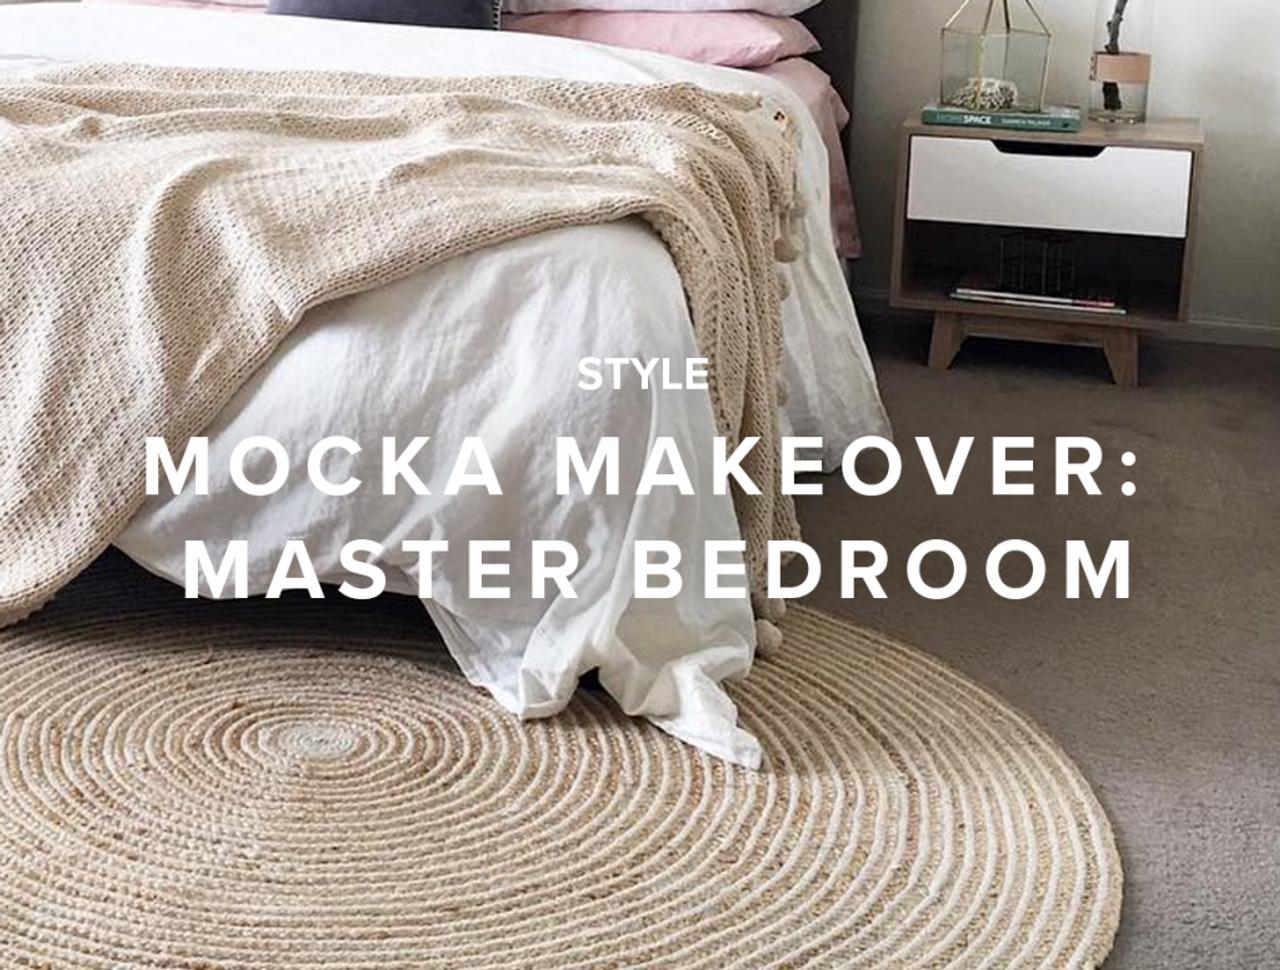 Mocka Makeover: Master Bedroom